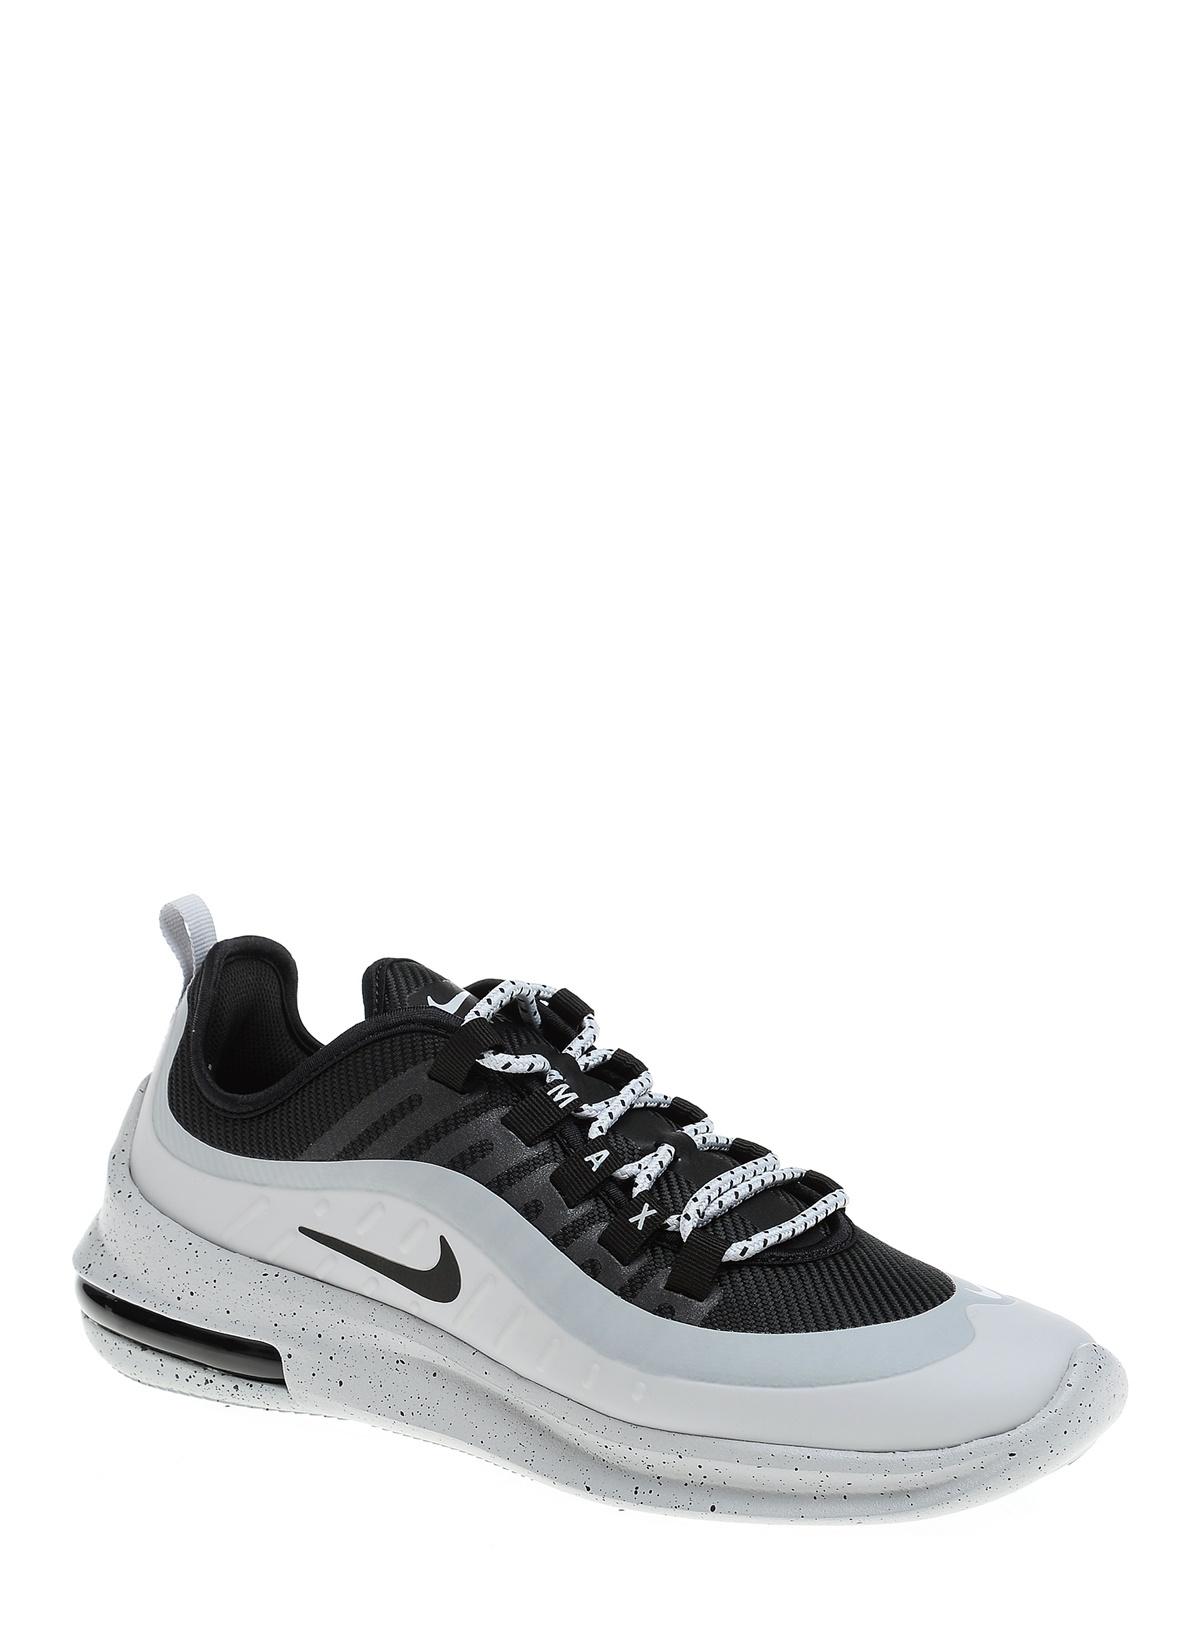 Nike Lifestyle Ayakkabı Erkek Indirim Nike Air Max 97